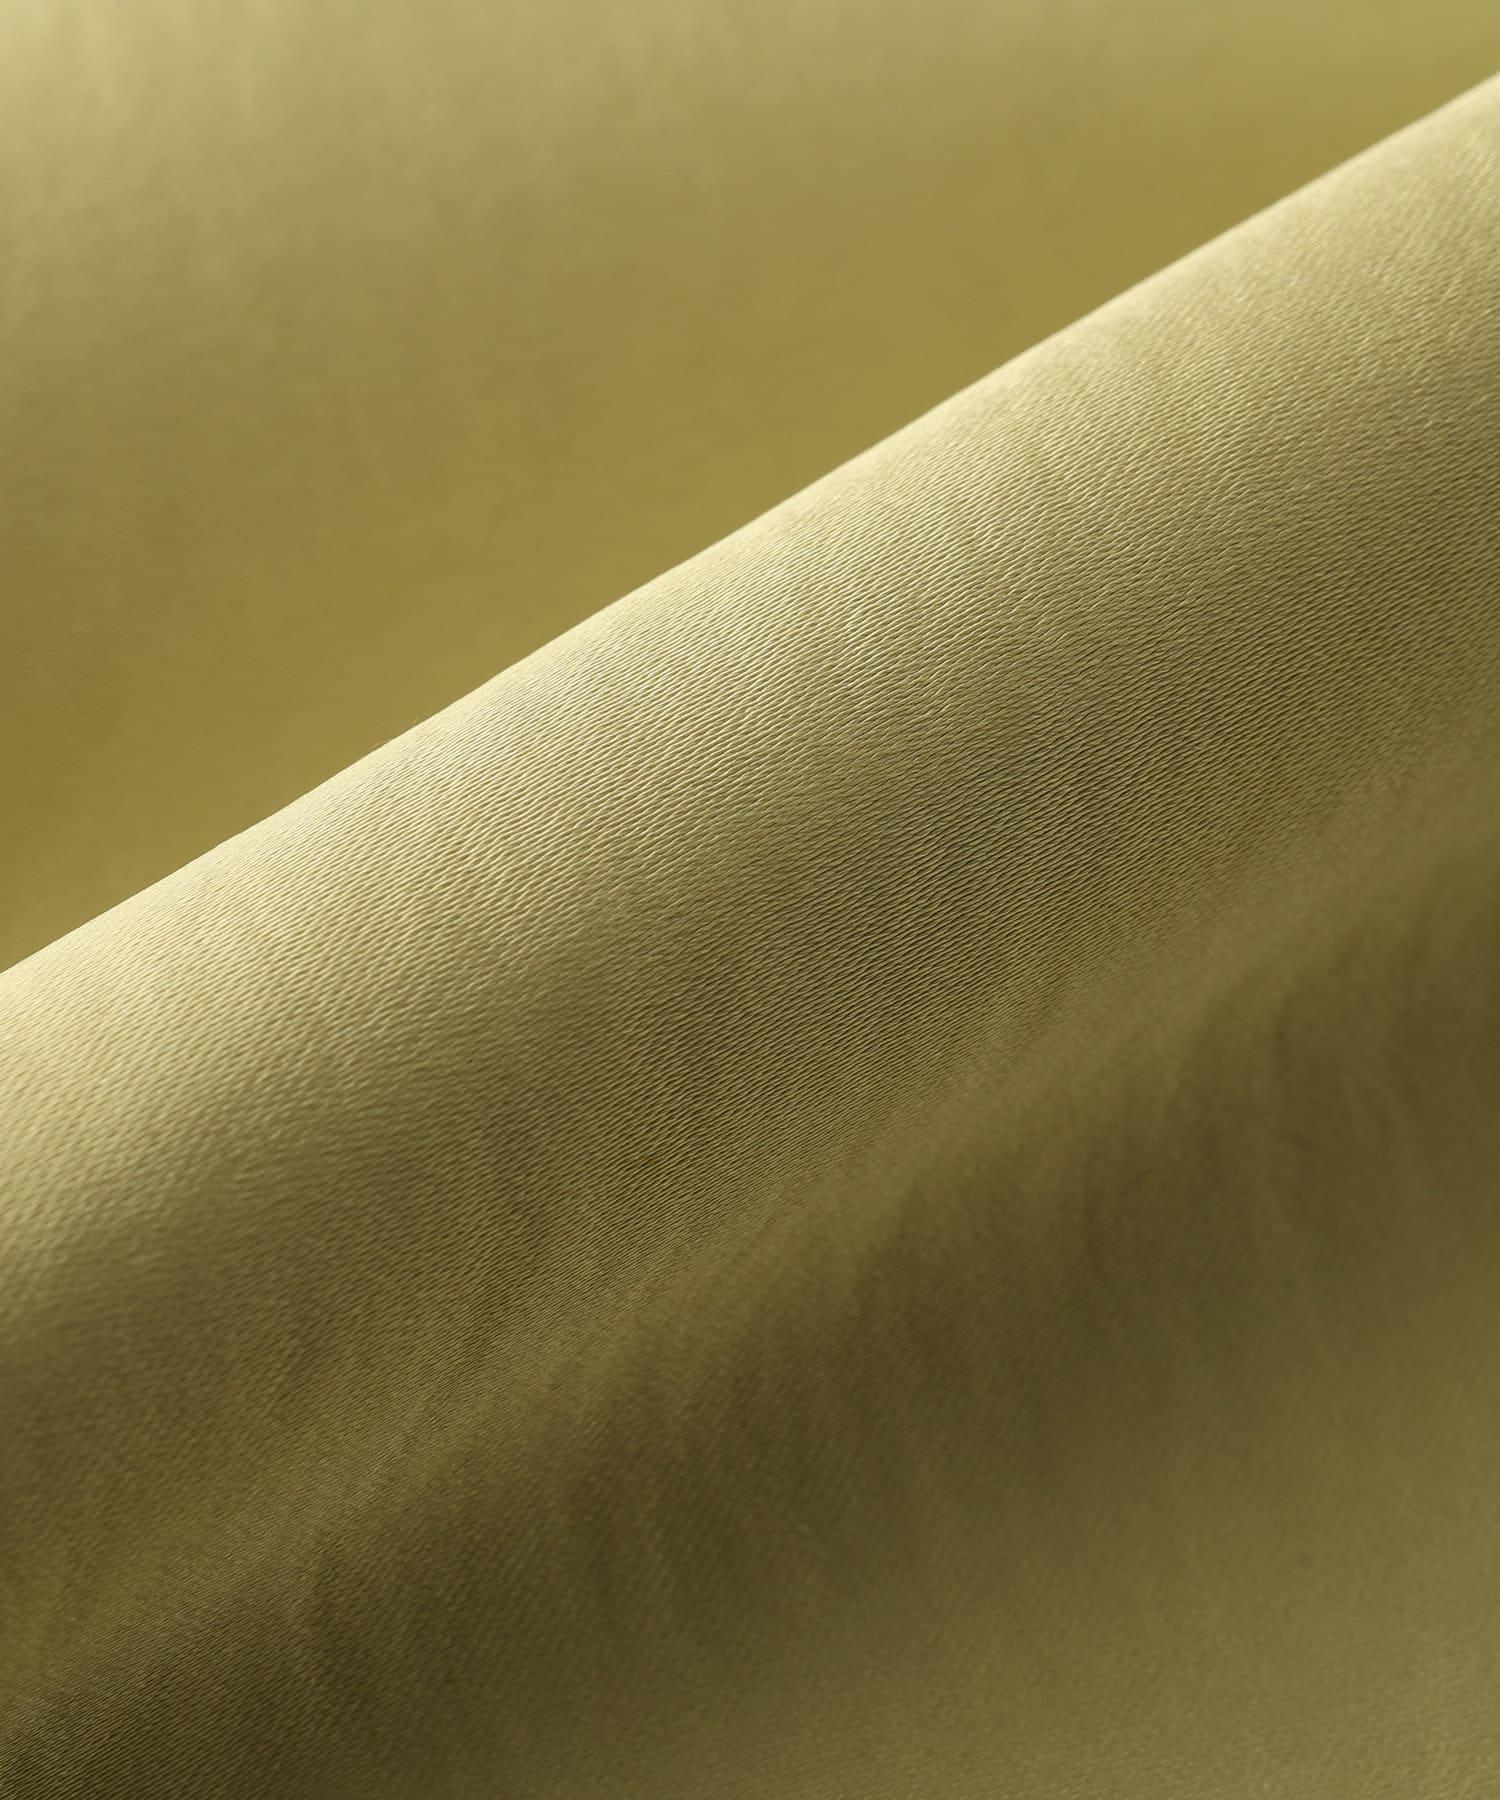 RIVE DROITE(リヴドロワ) 【滑らかな風合いと落ち感が魅力】サテンバイヤススカート